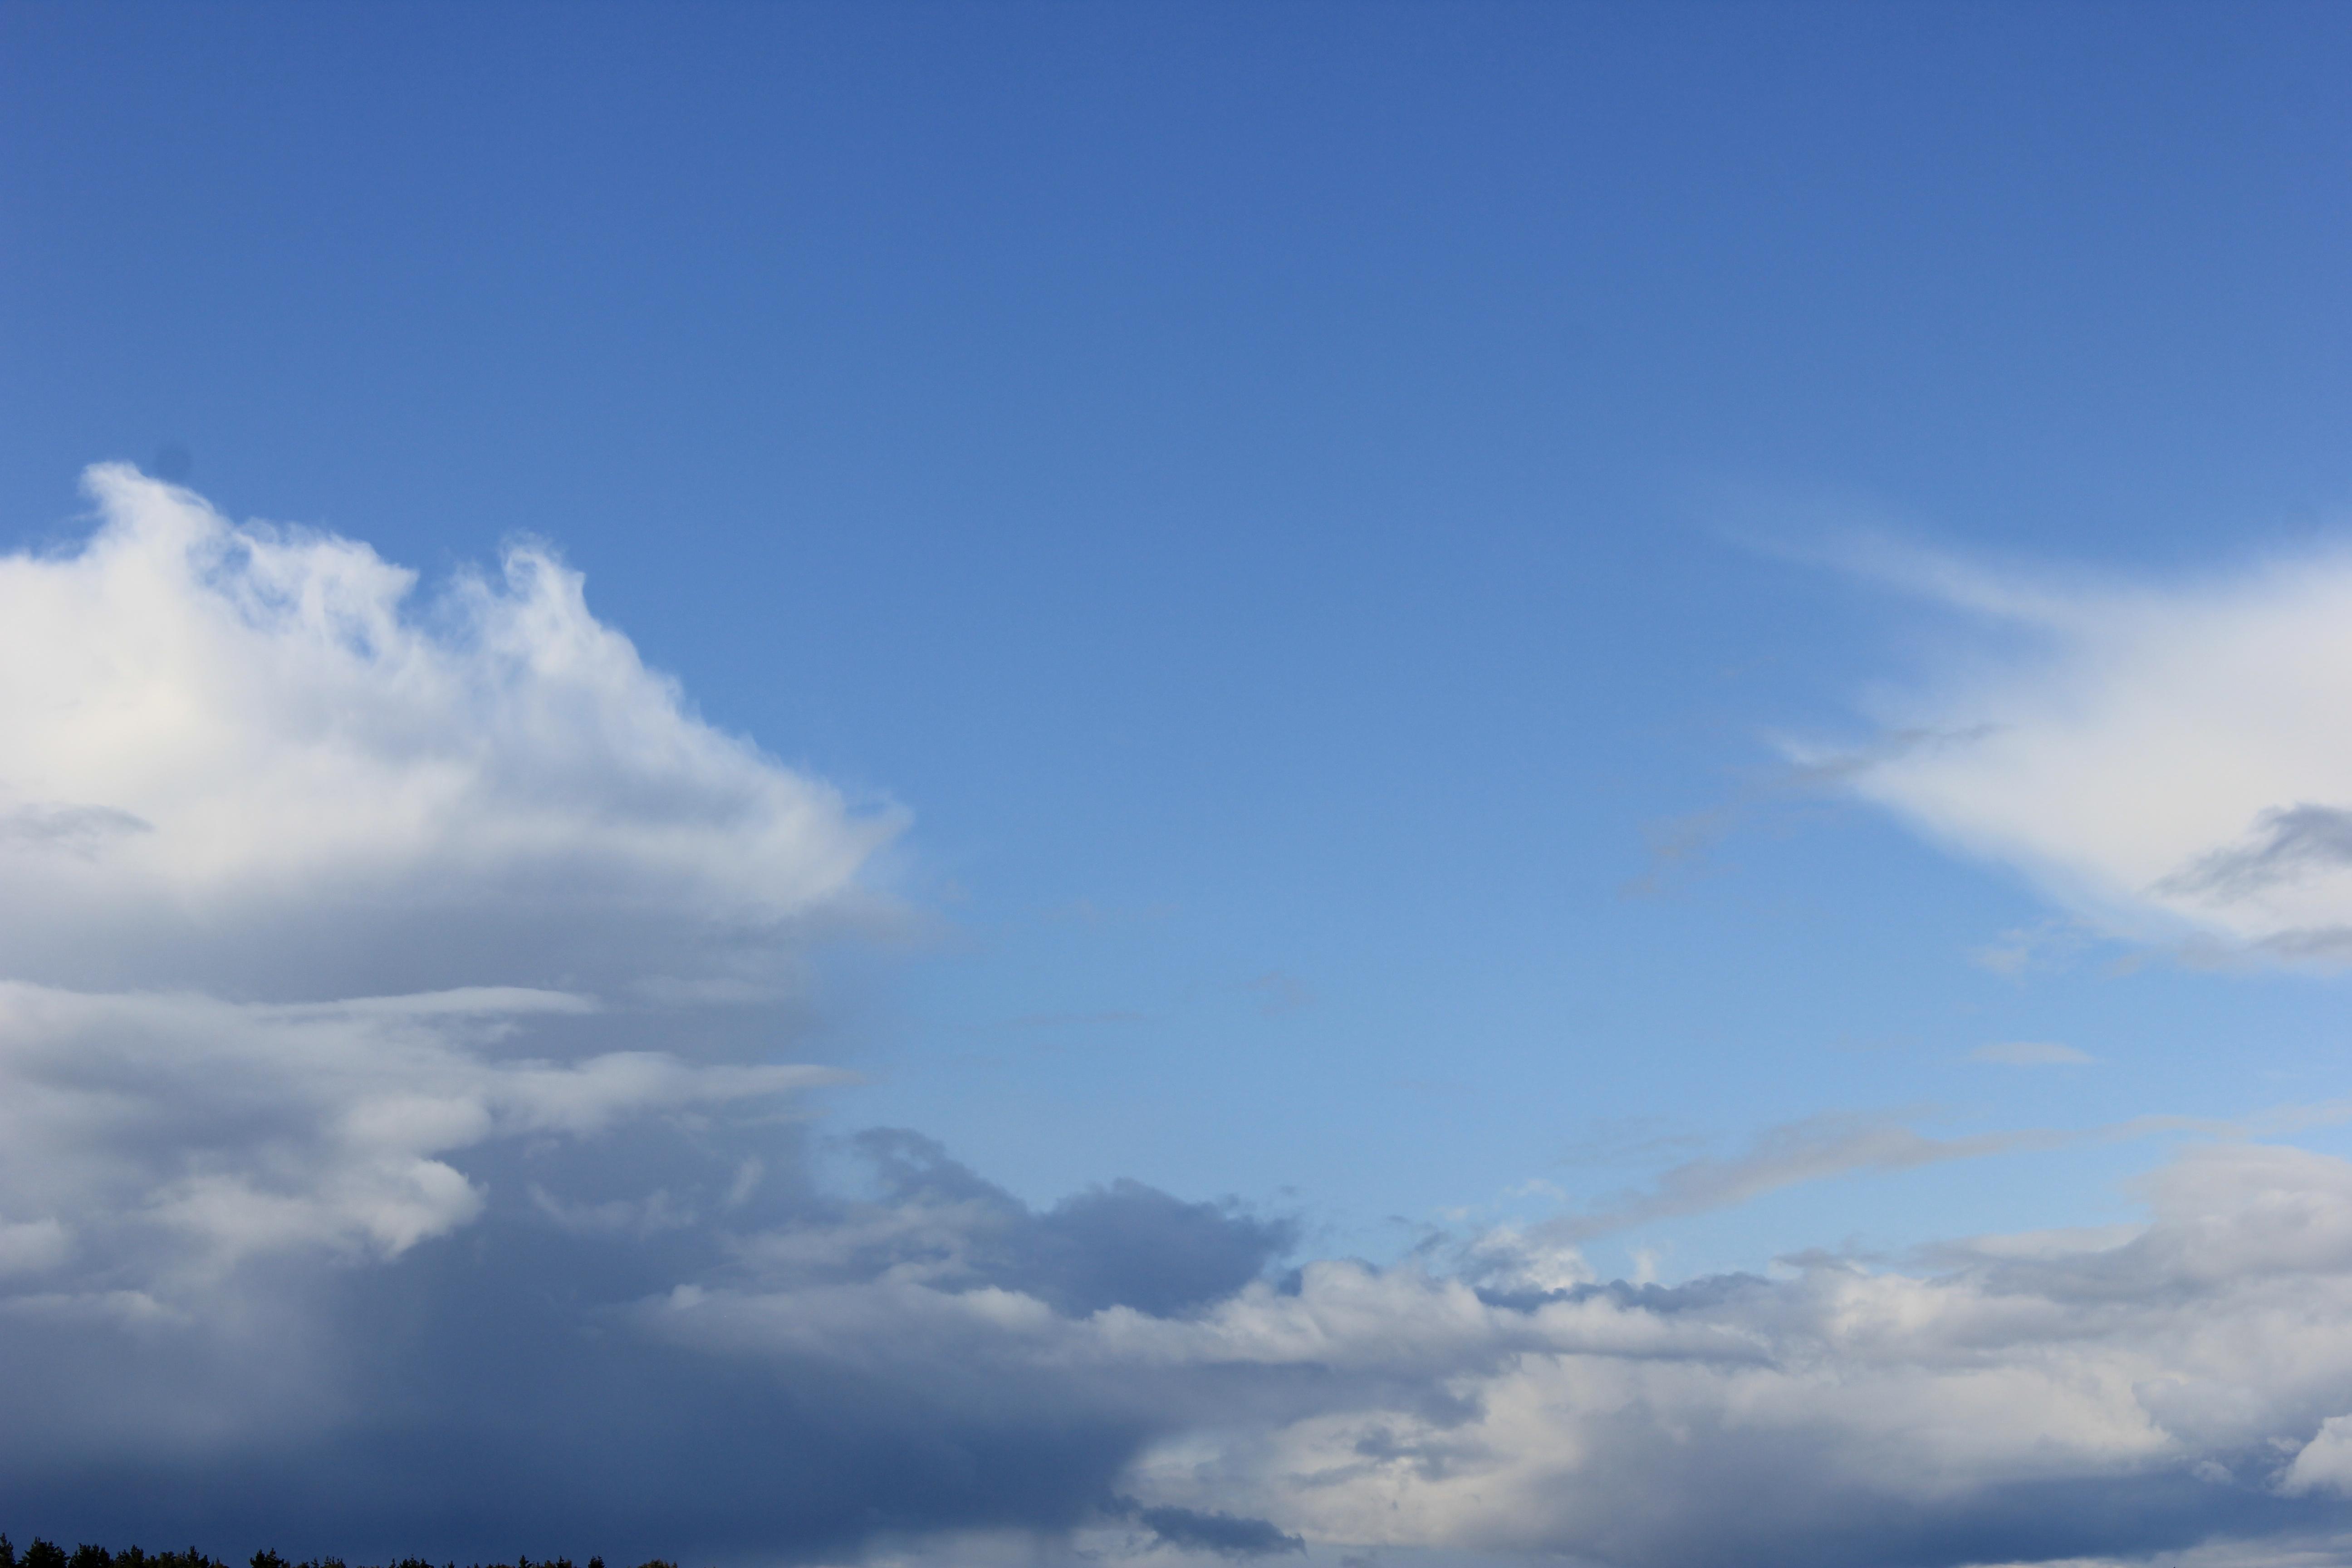 прелести небо сентября (12)